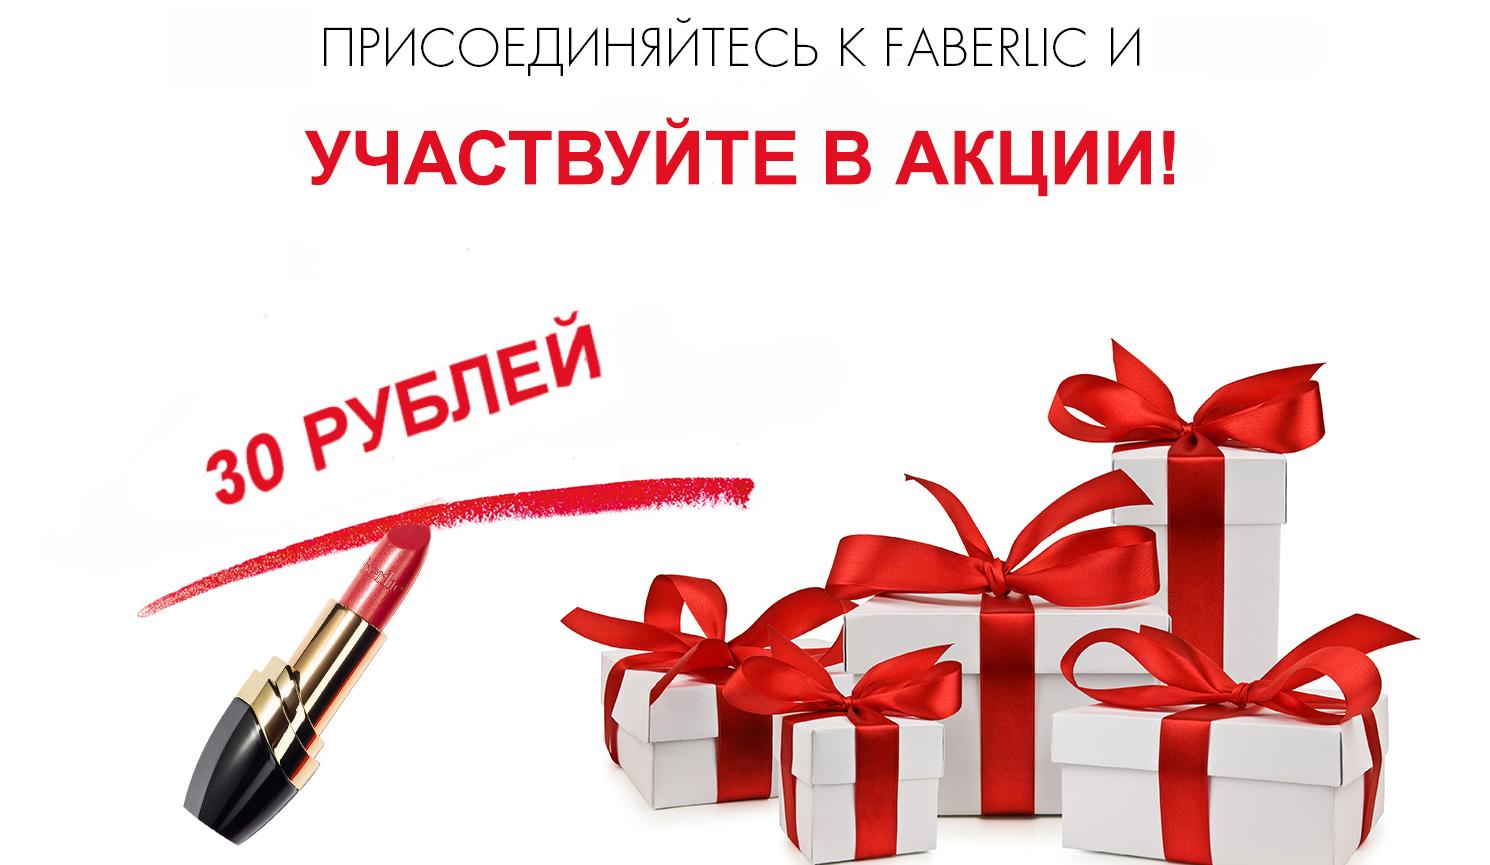 Фаберлик дарит 30 рублей